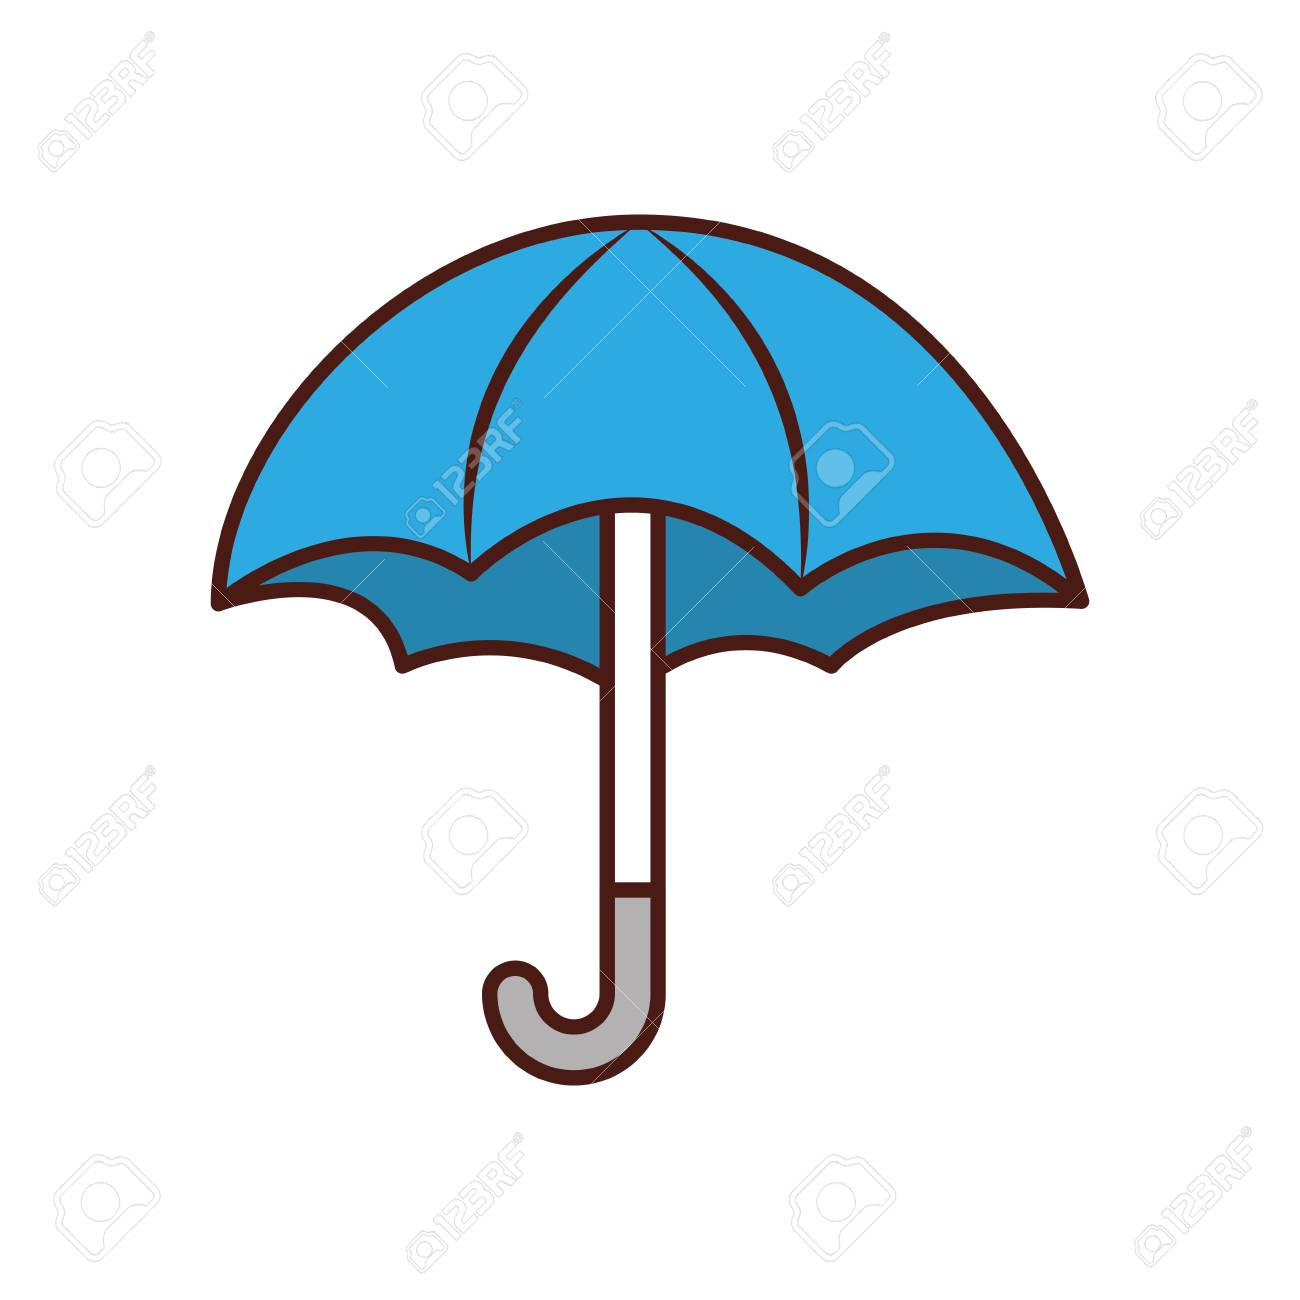 cute umbrella isolated icon vector illustration design royalty free